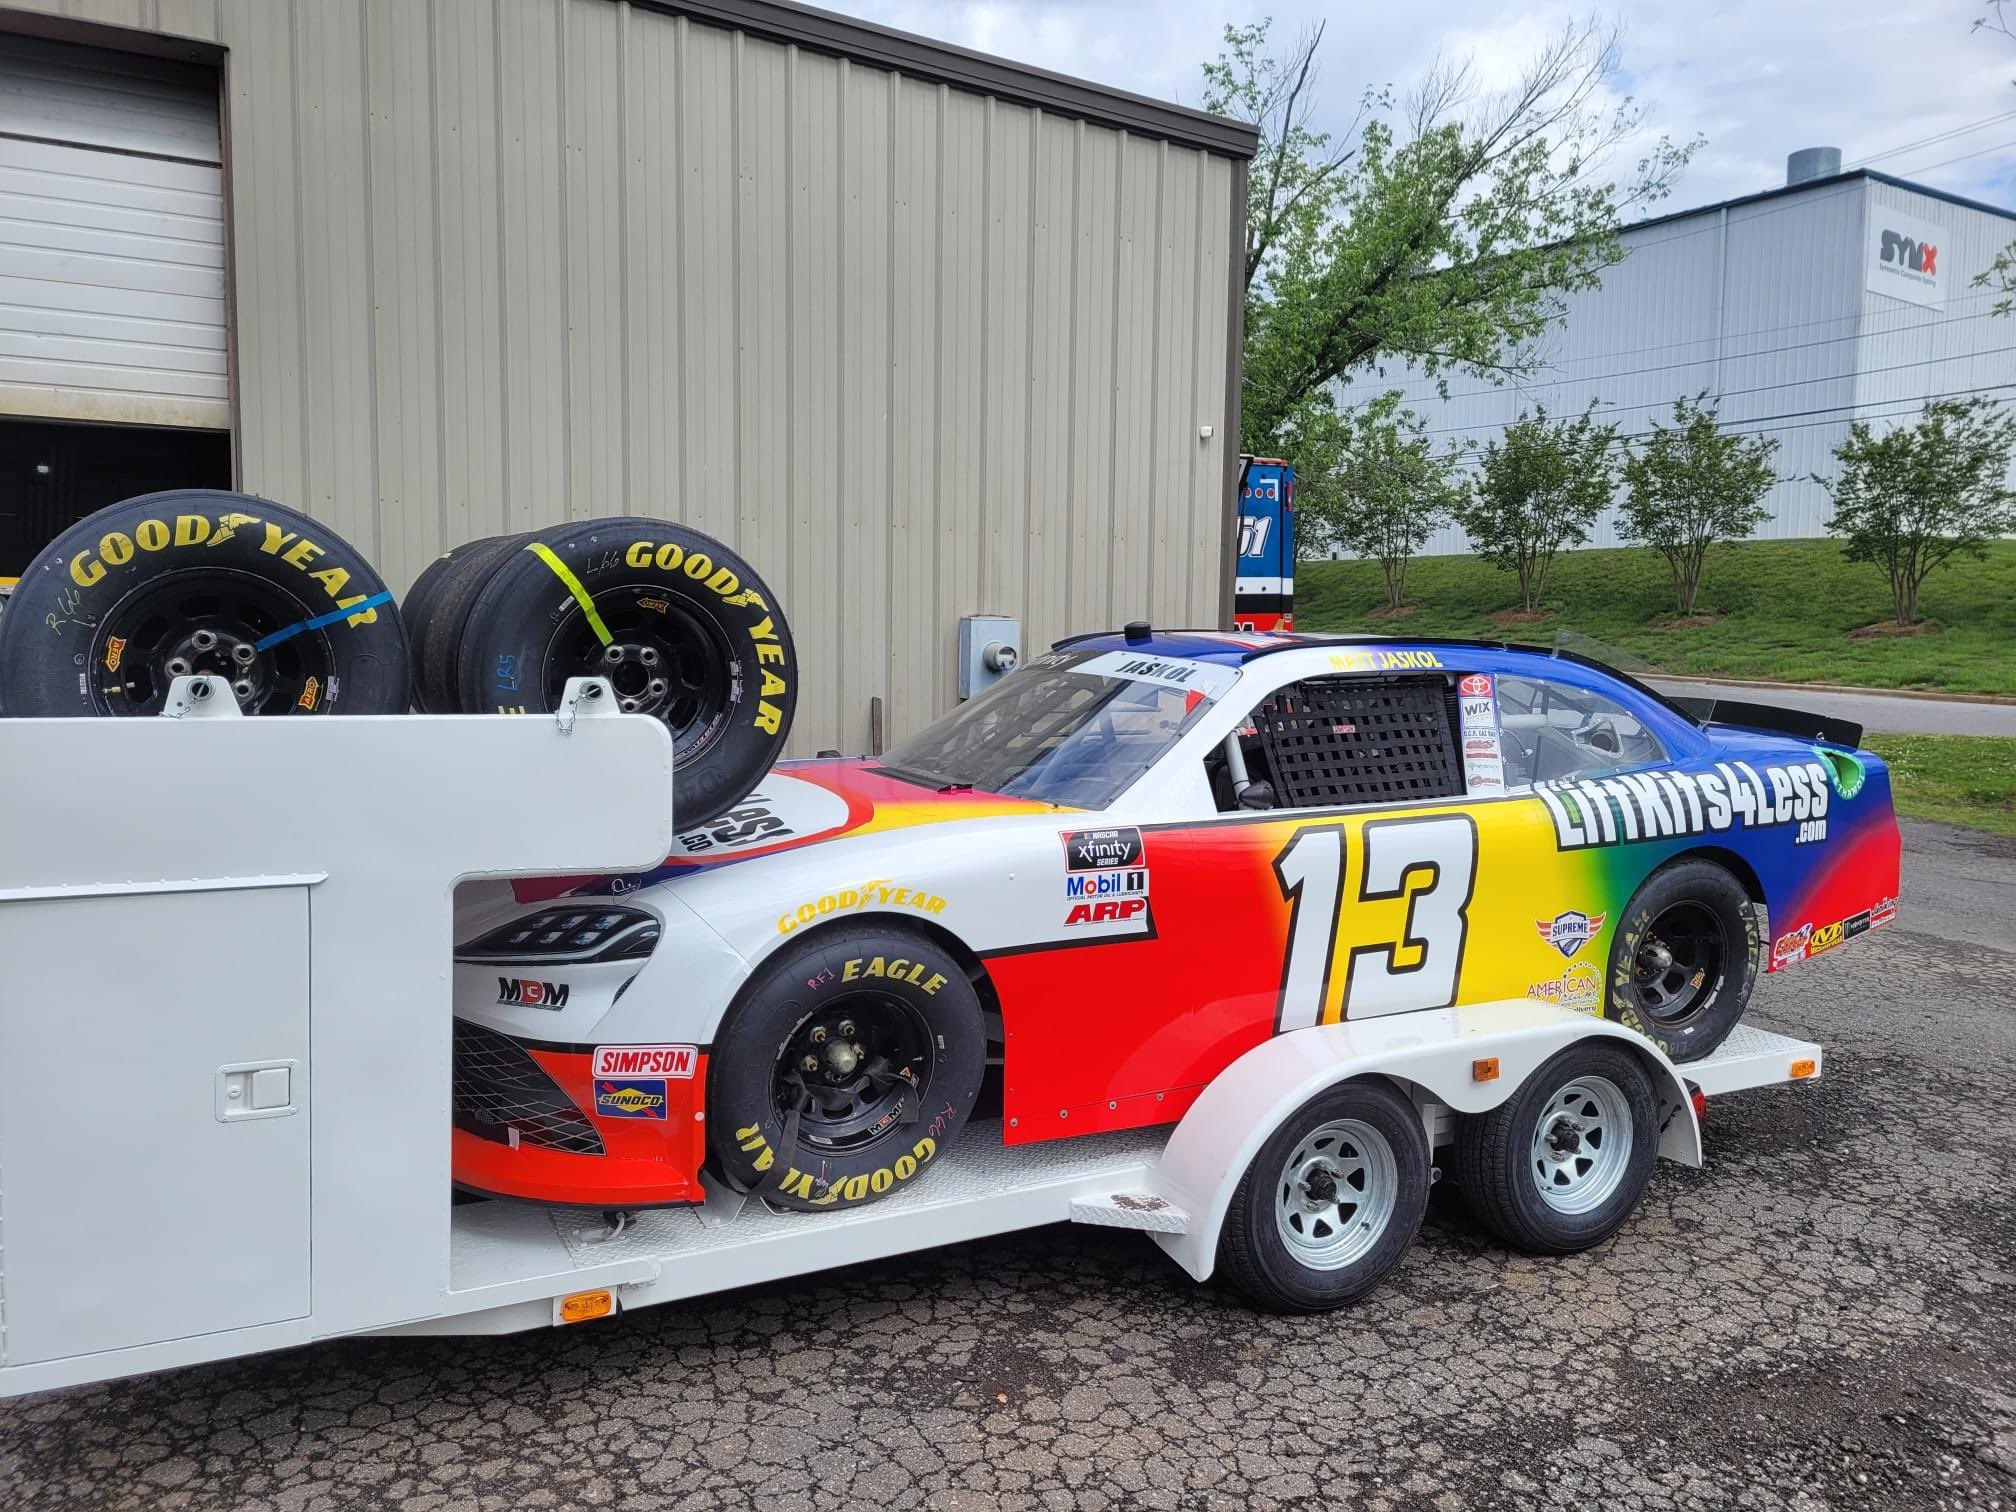 MBM Motorsports - Open NASCAR trailer